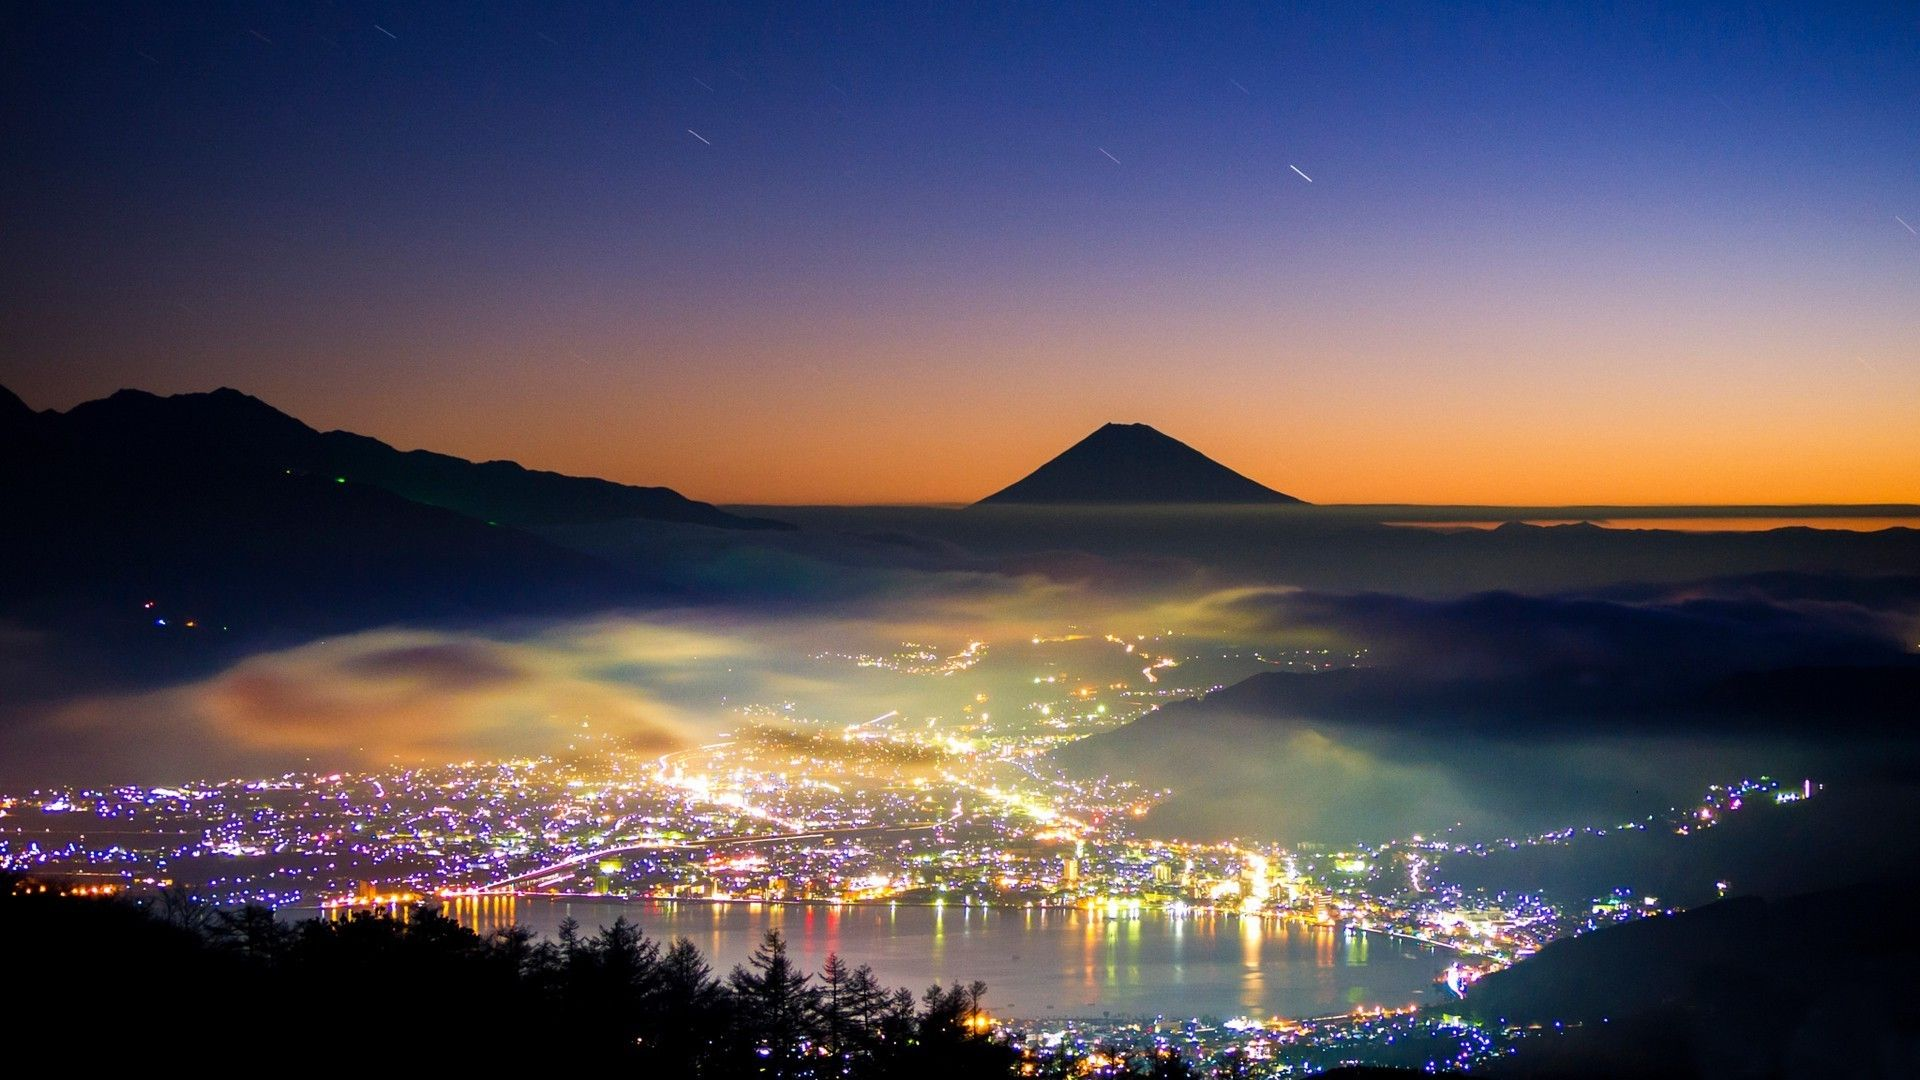 Mount Fuji Japan Wallpapers Top Free Mount Fuji Japan